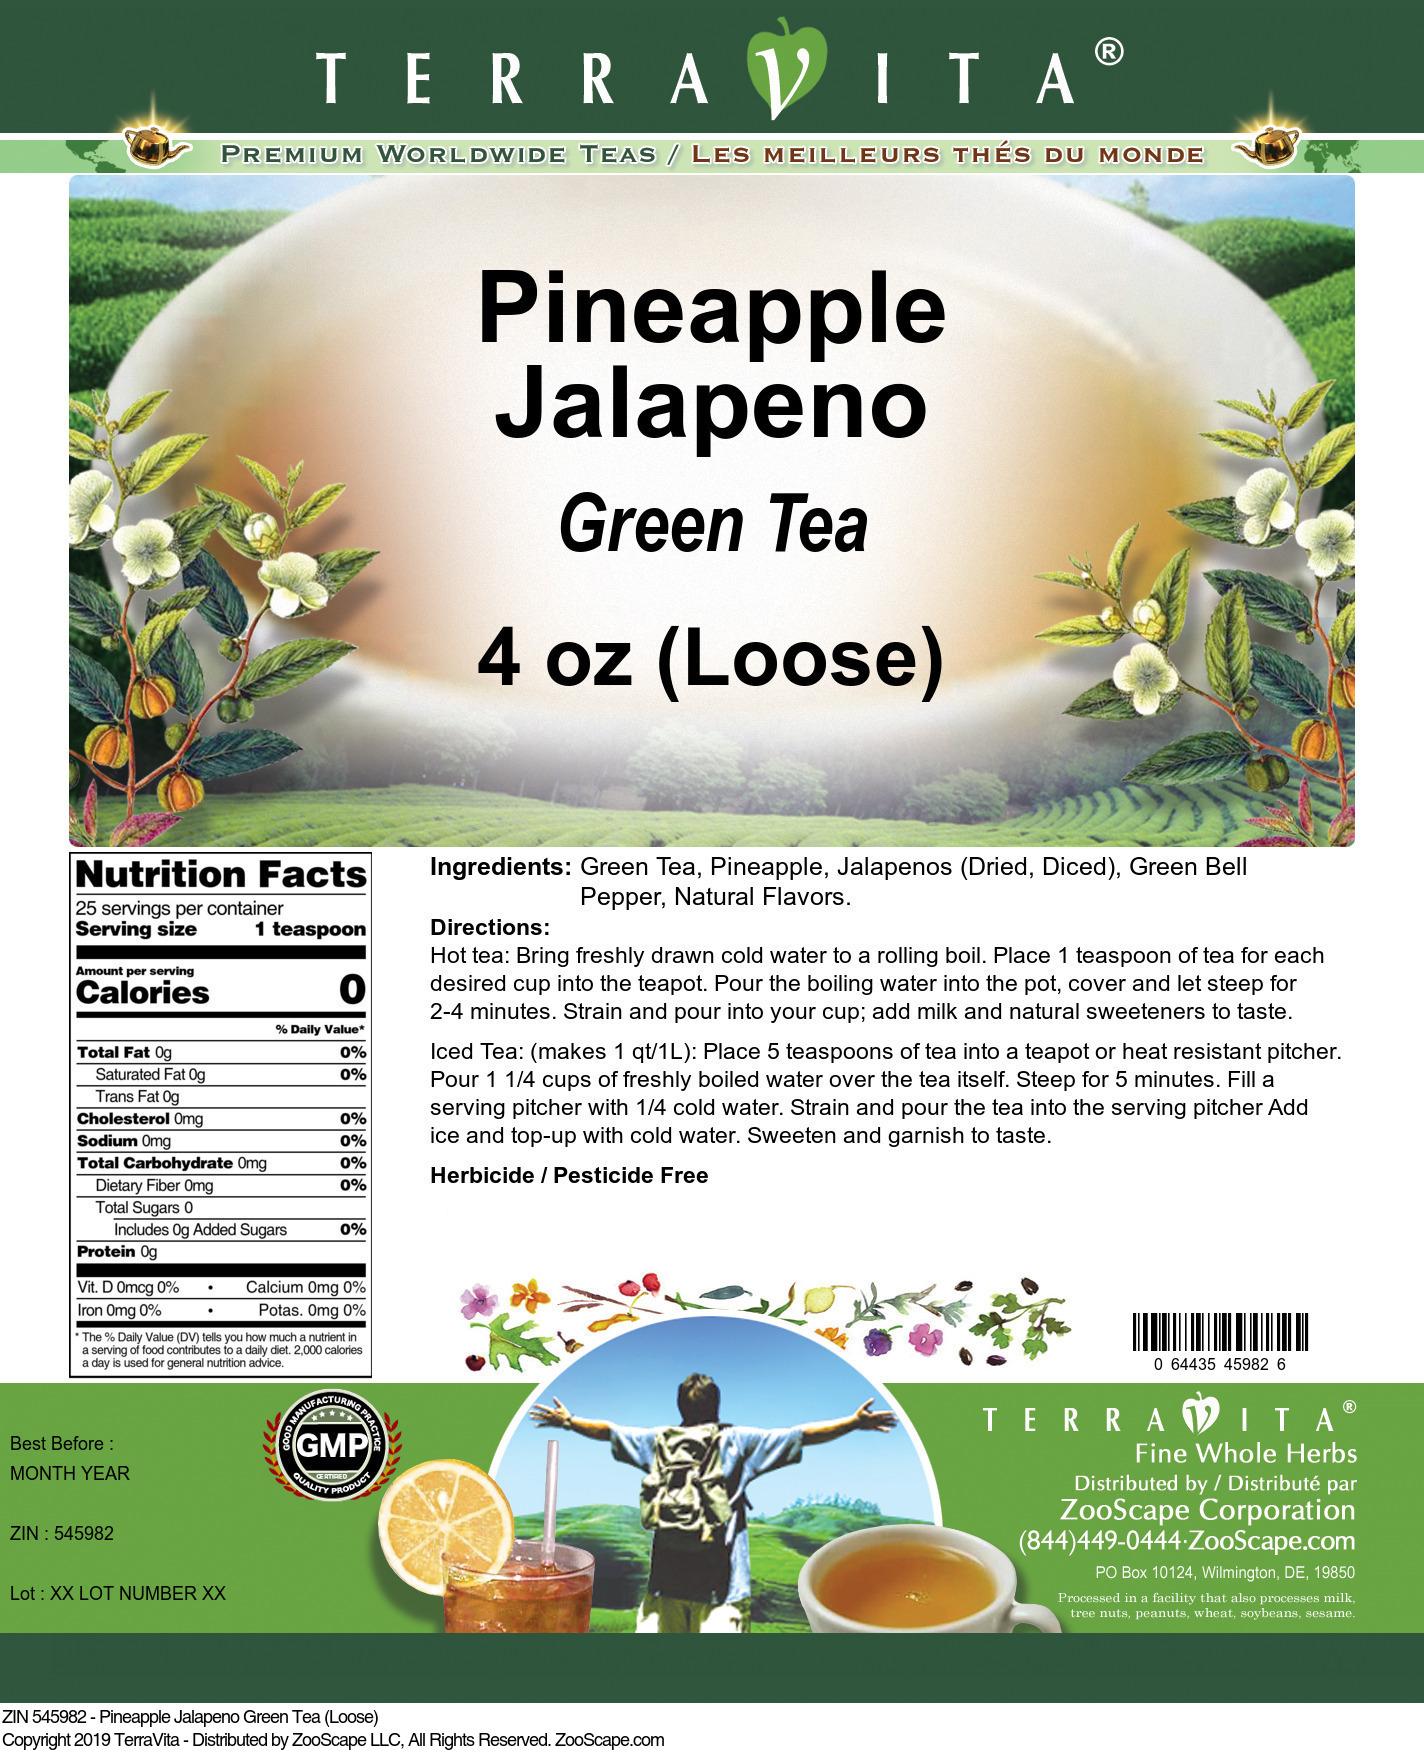 Pineapple Jalapeno Green Tea